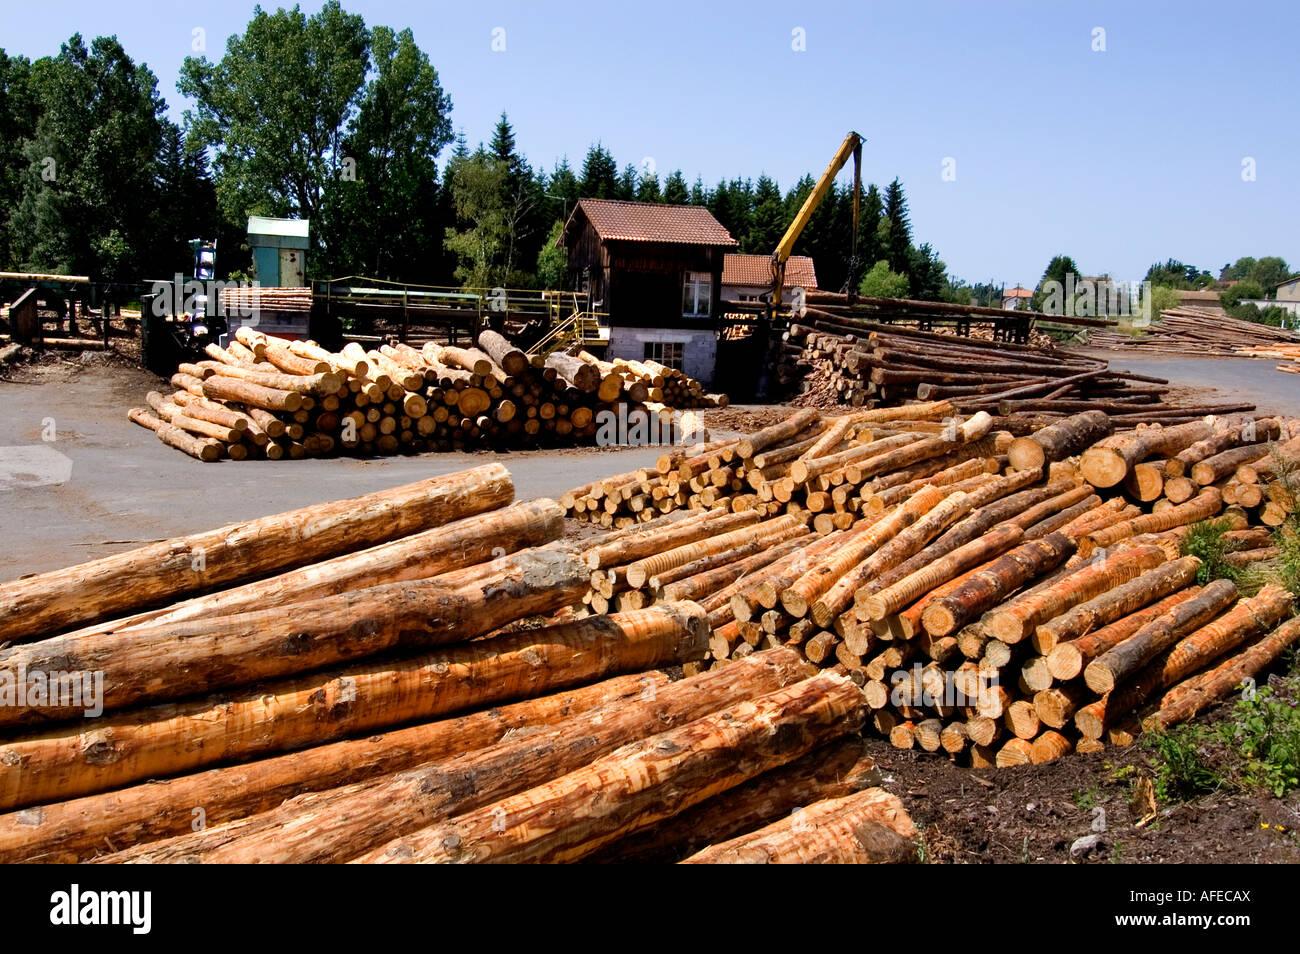 Saw mill timber wood sawyer lumber lumberjack